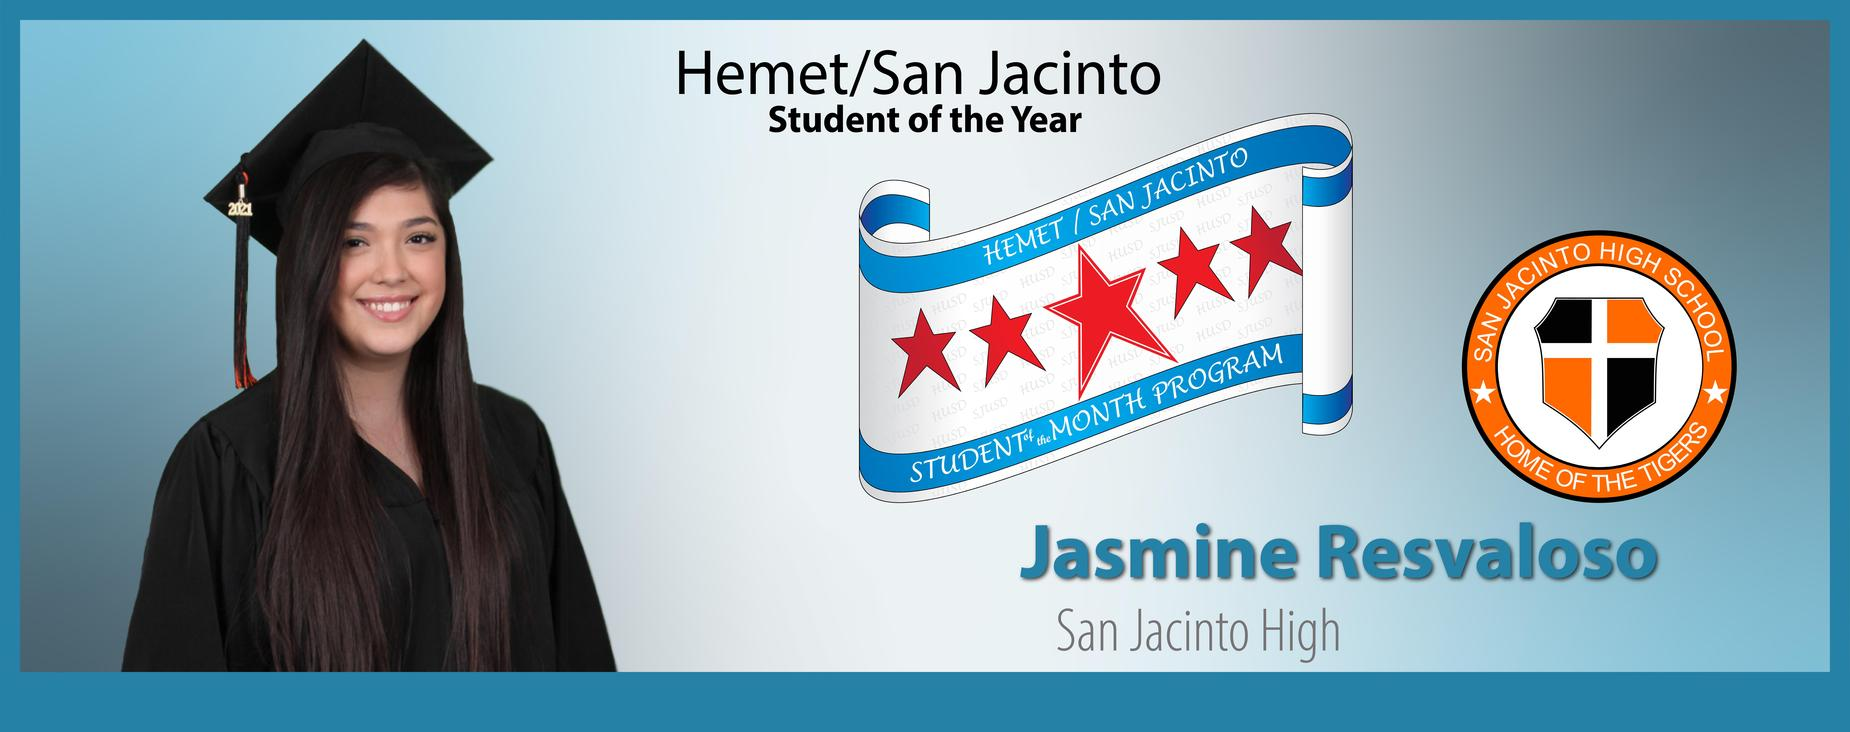 Jasmine Resvaloso Student of the Year